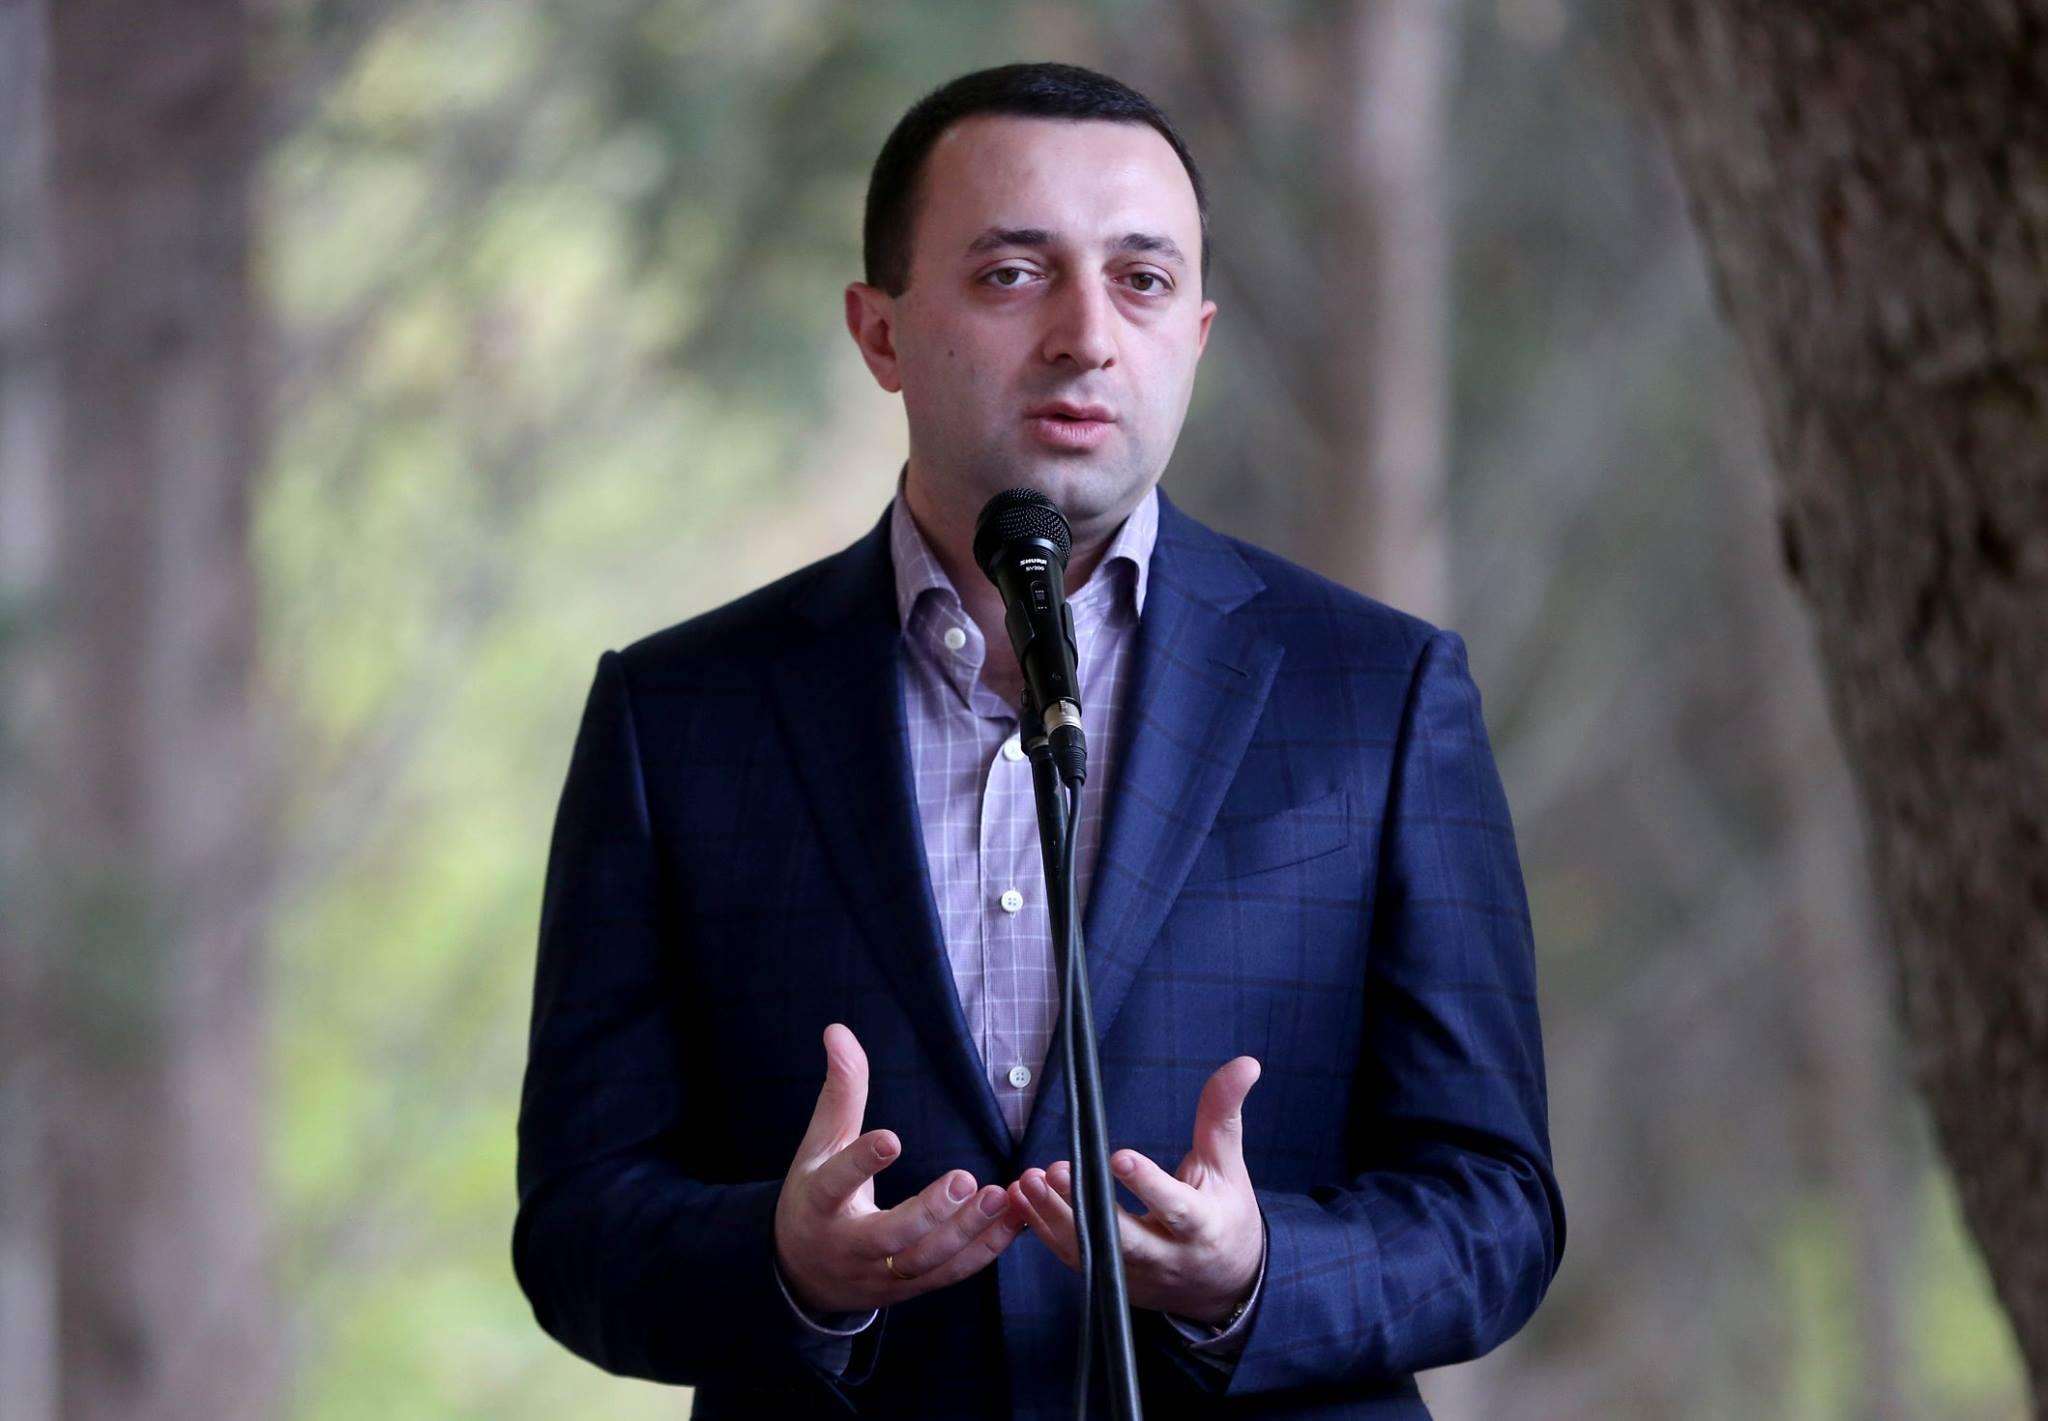 Irakly Gharibashvili 3 #новости Афганистан, Грузия, миссия в Афганистане, НАТО, Премьер-министр Грузии